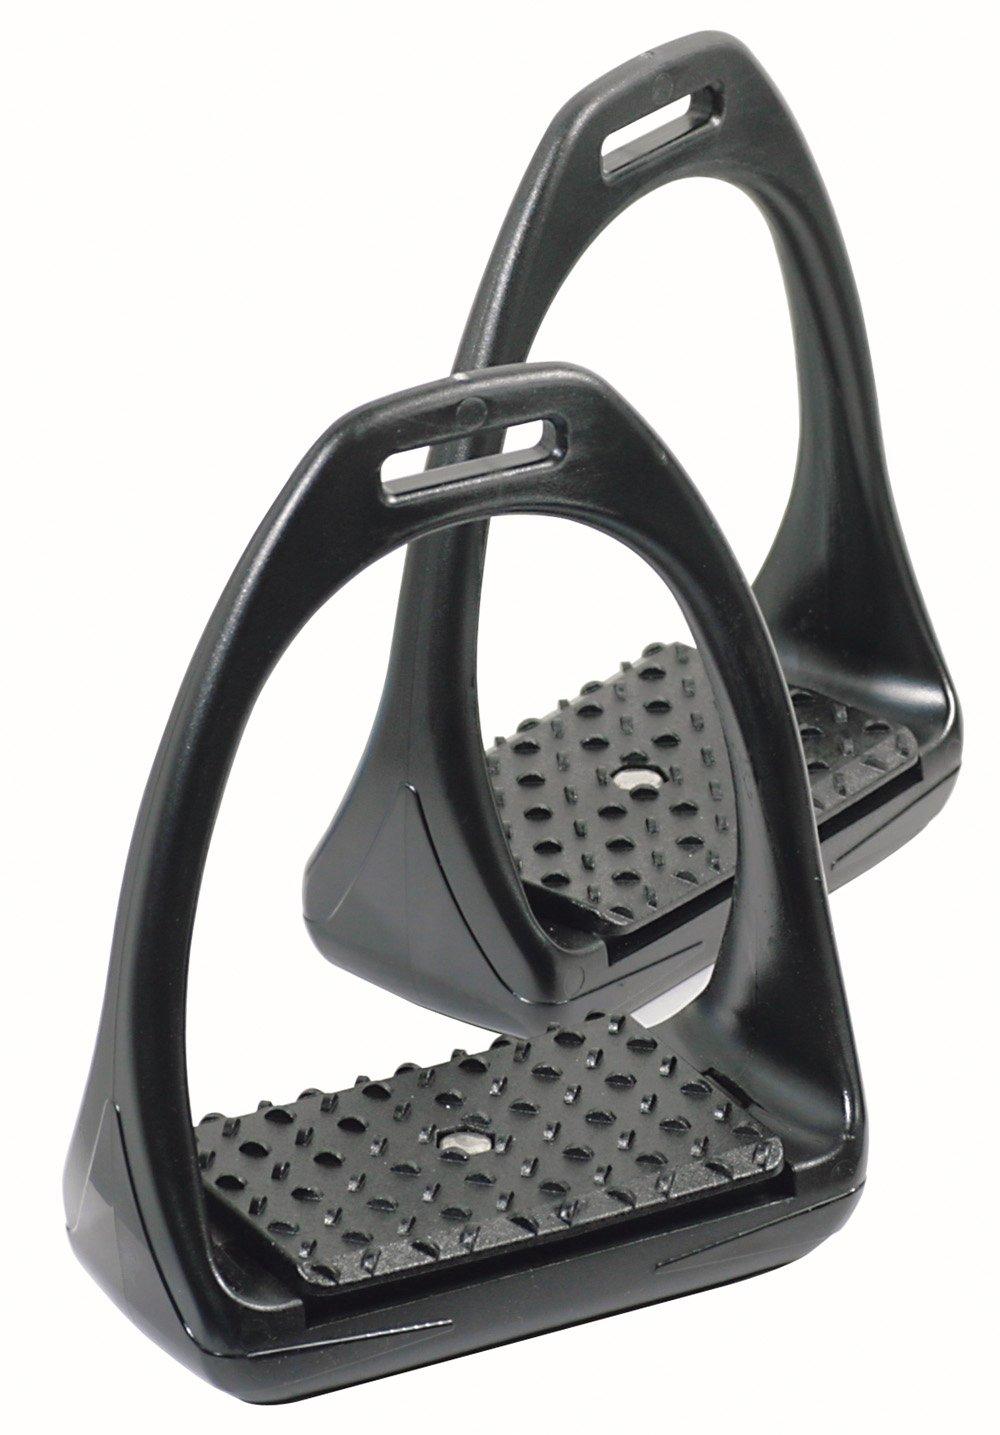 PFIFF Flexi Stirrup Irons With Flex. Tread Black Full